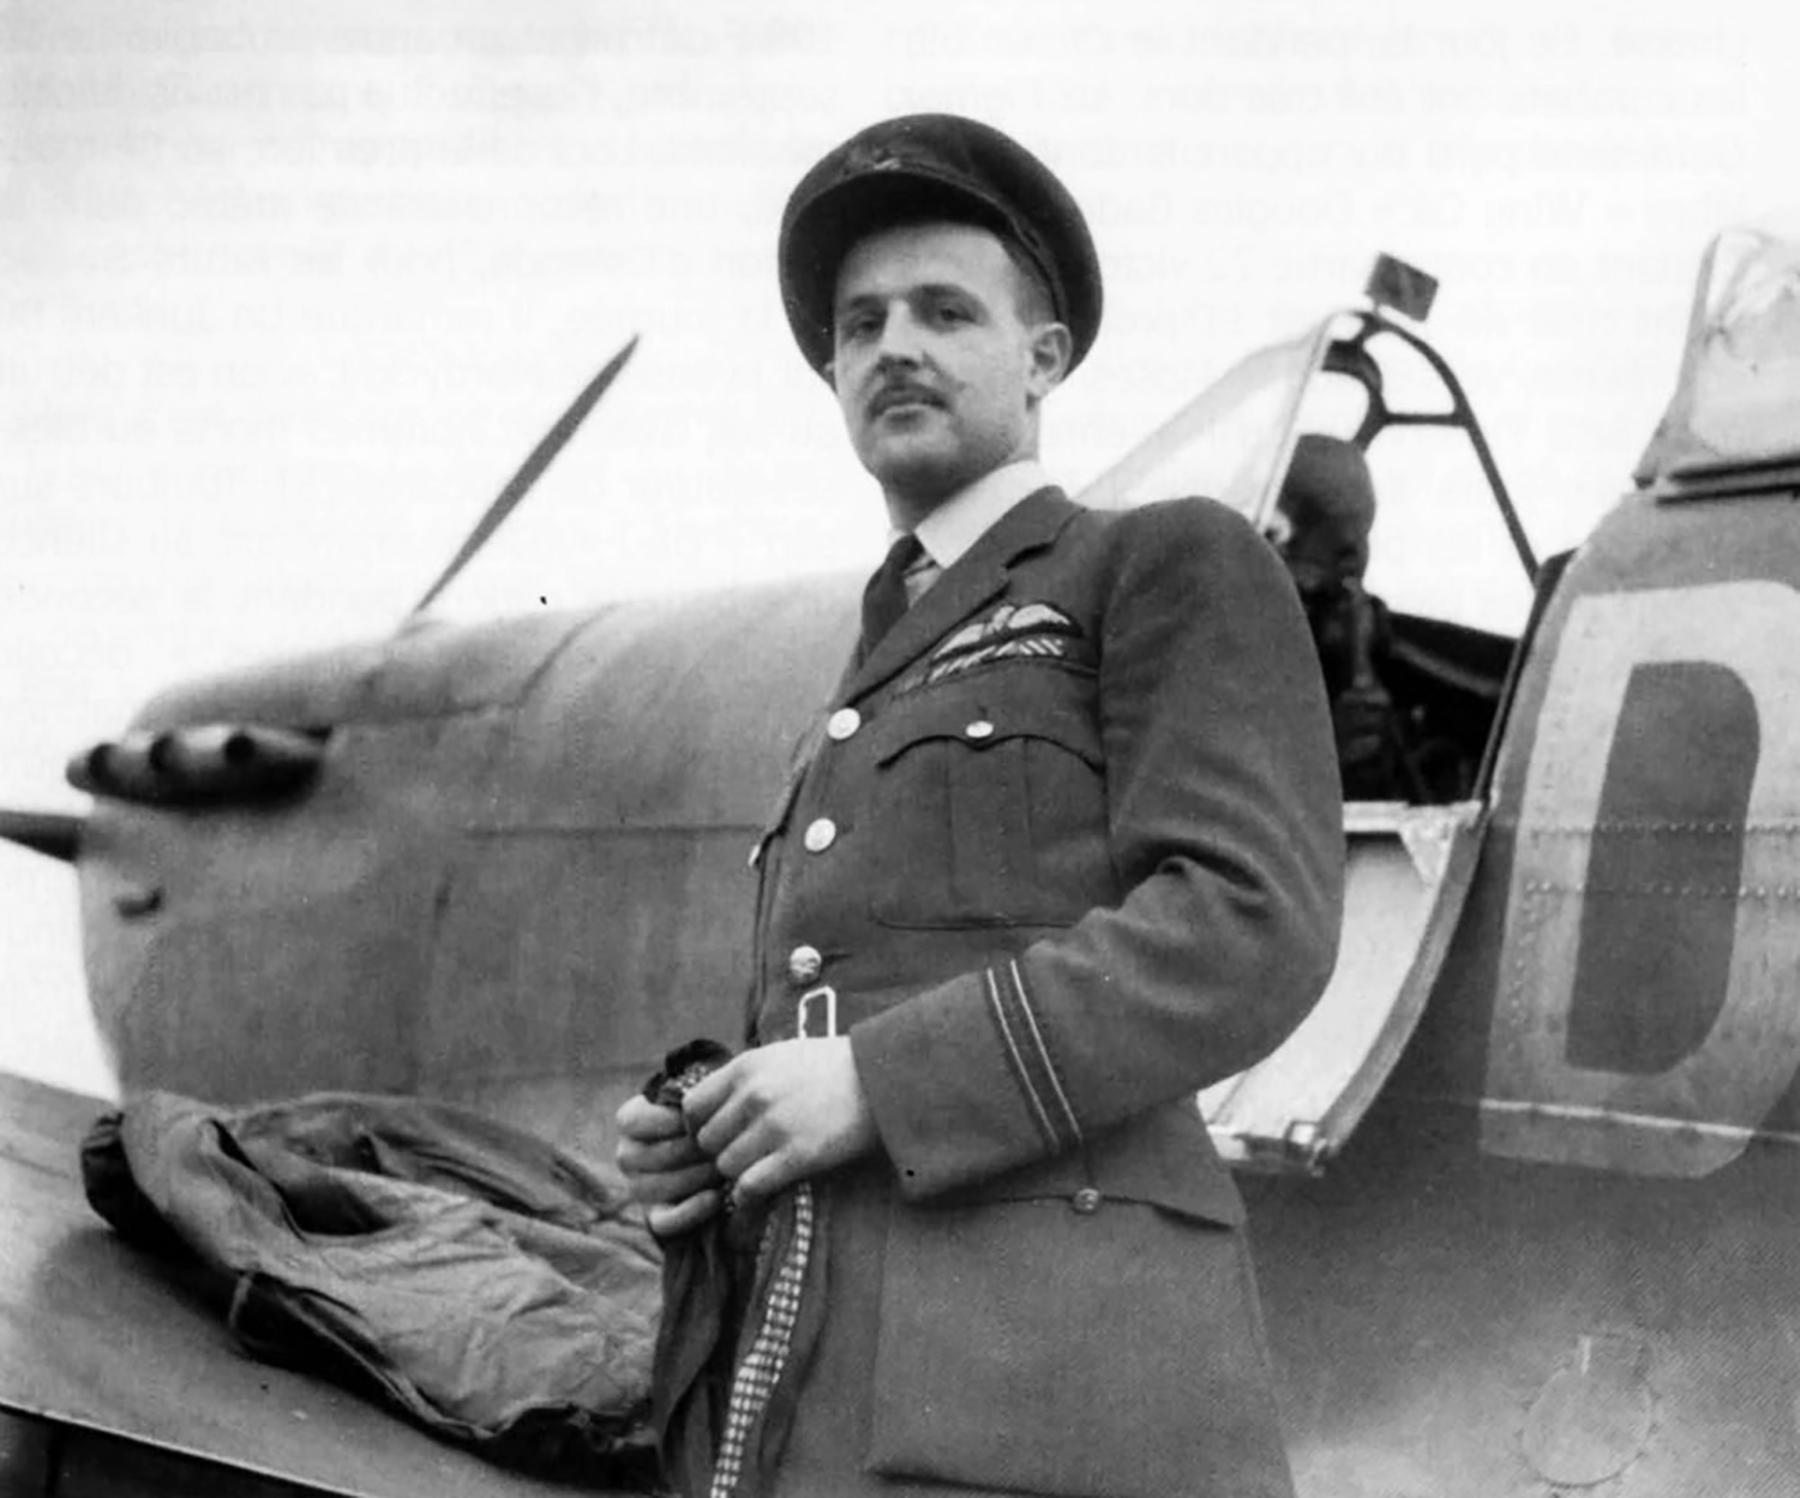 Spitfire MkVb RAF 91Sqn DL Jean Demozay next to W3175 SL HD Cooke aircraft Hawkinge 1941 01